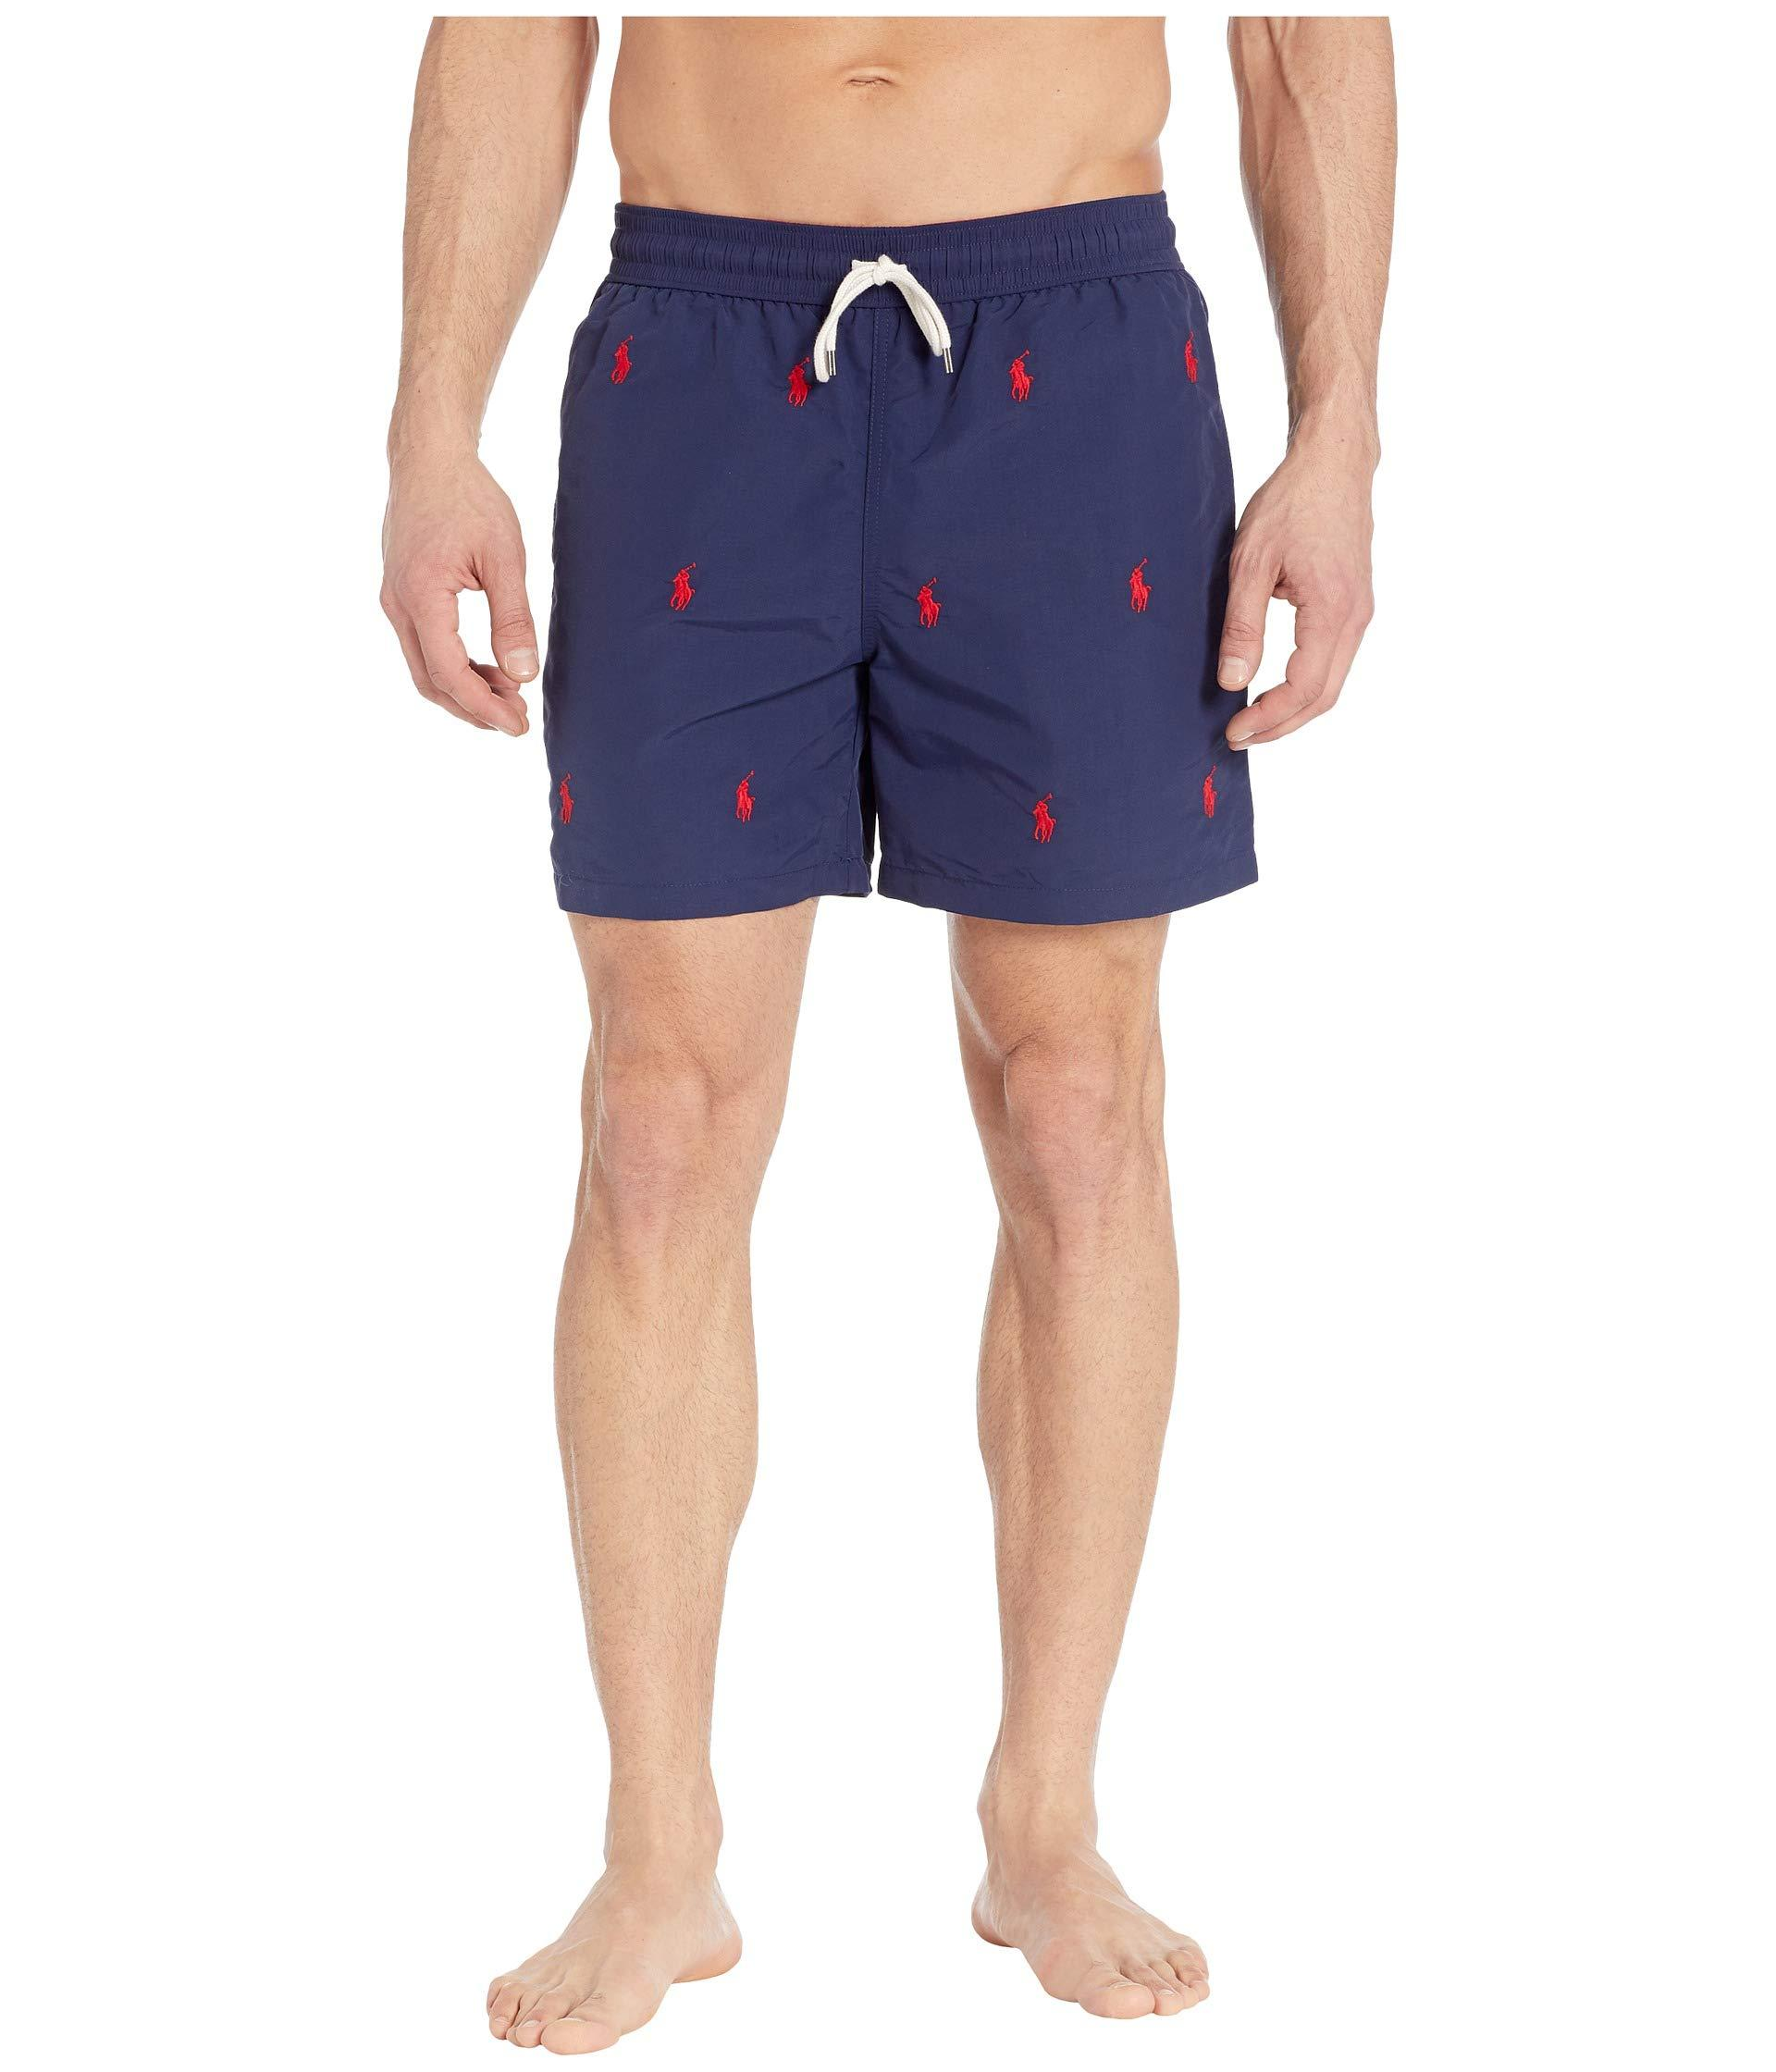 c7ad4a6409 Polo Ralph Lauren - Blue Traveler Swim Trunks (newport Navy/aoe) Men's  Swimwear. View fullscreen